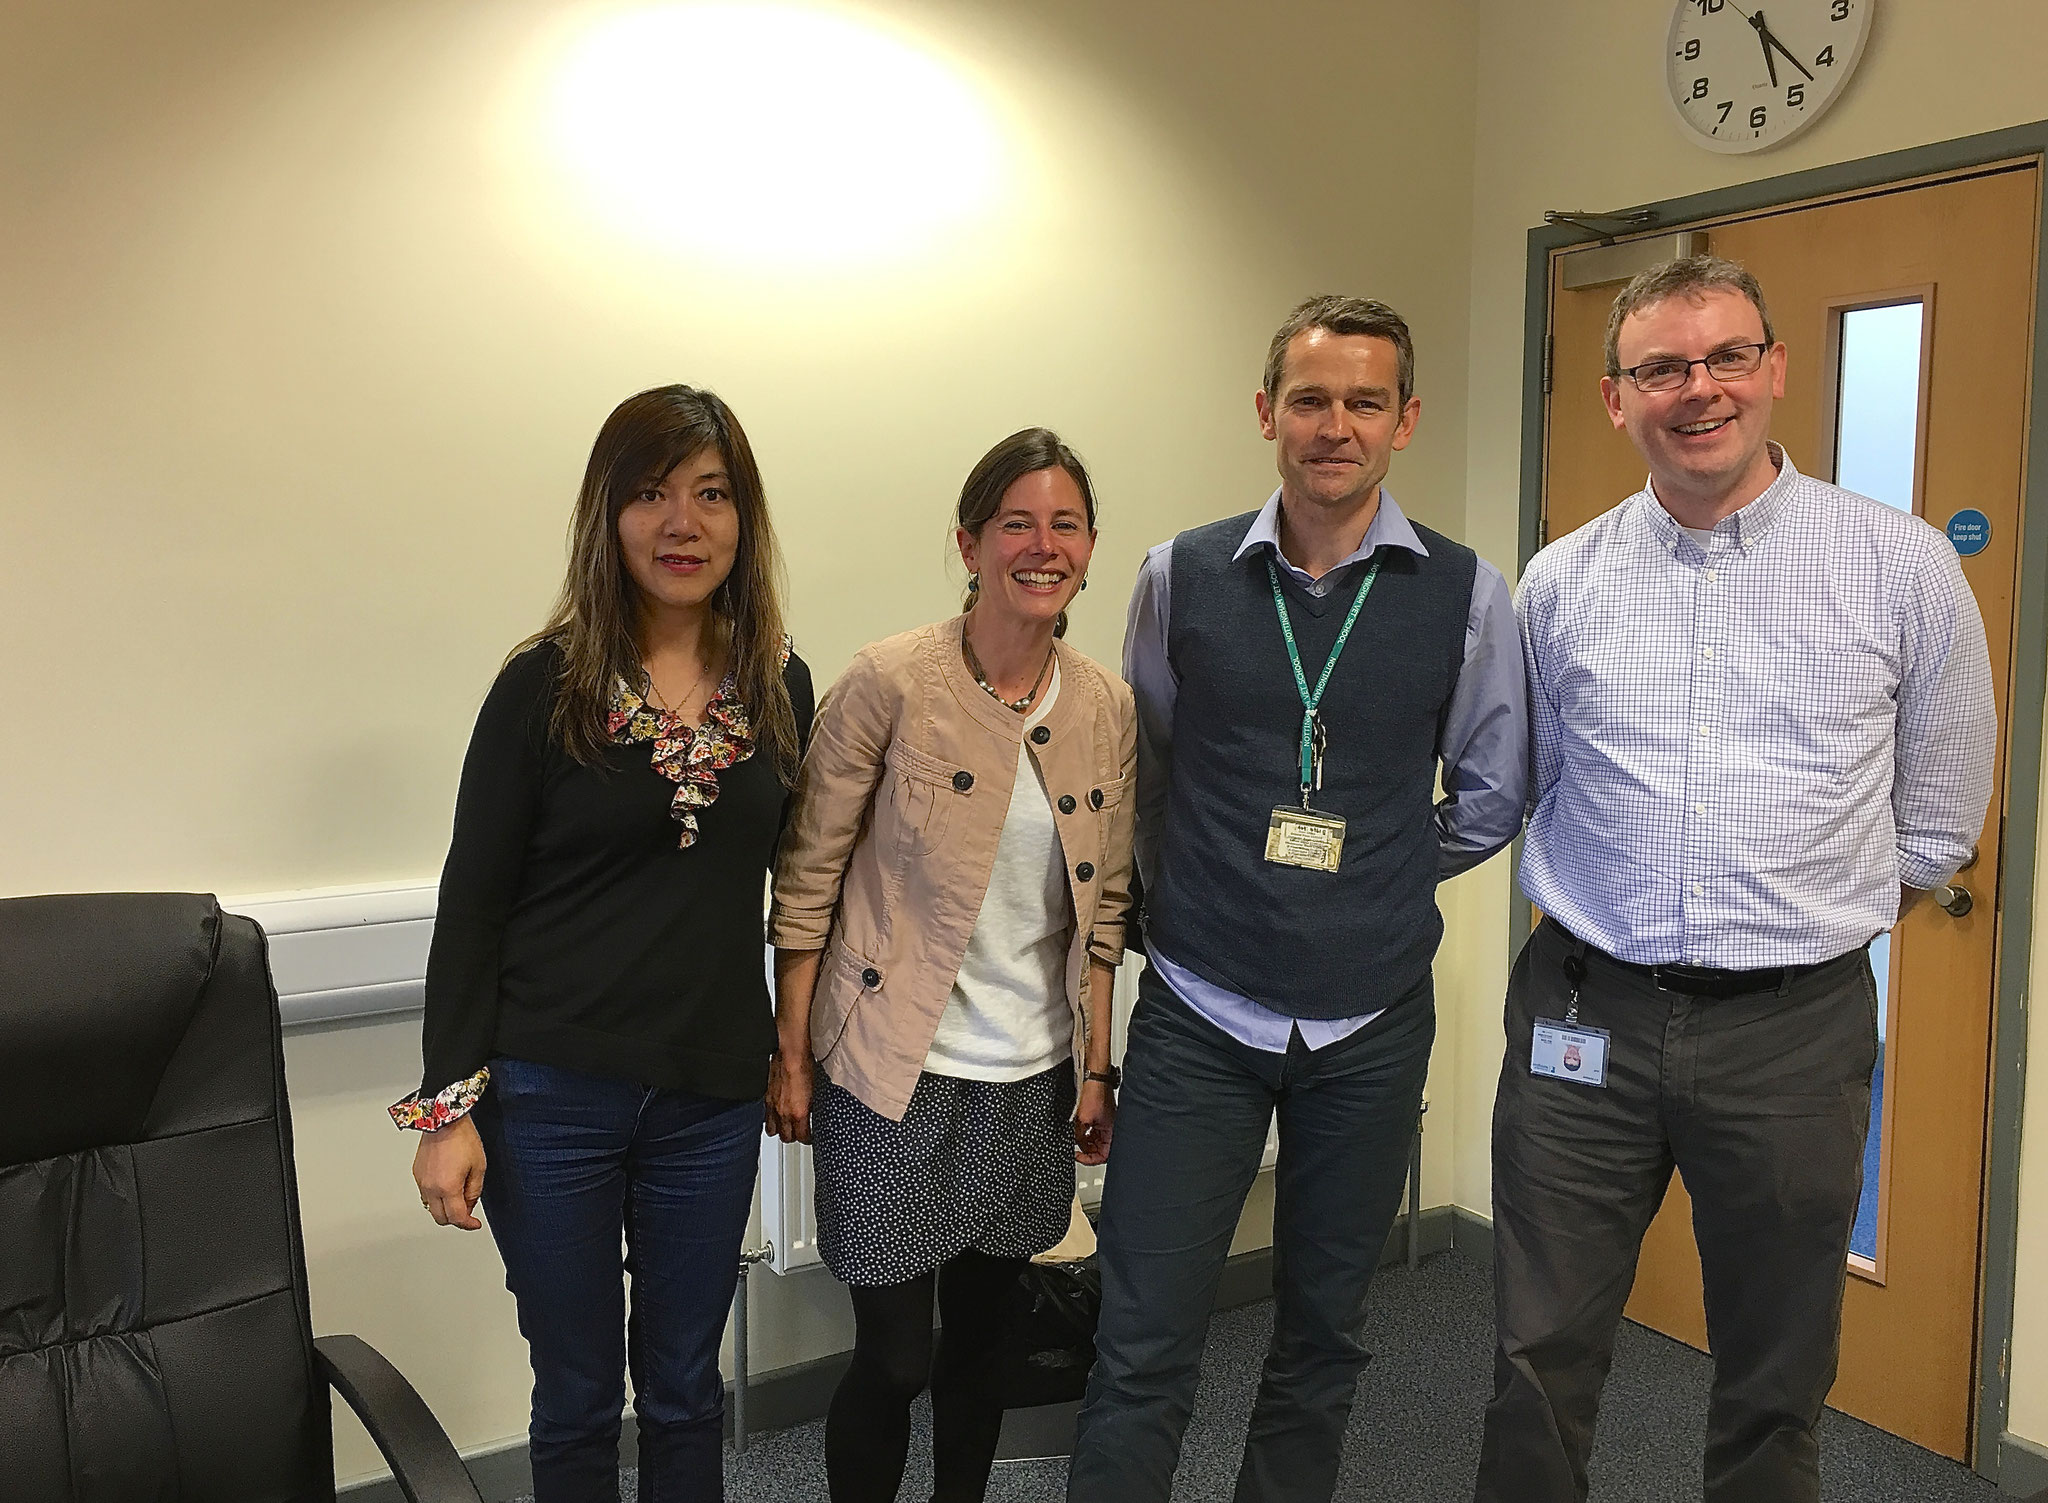 Dr. Jenny Persson, Dr. Simone de Brot, Dr. David Gardner, Dr. Nigel Mongan